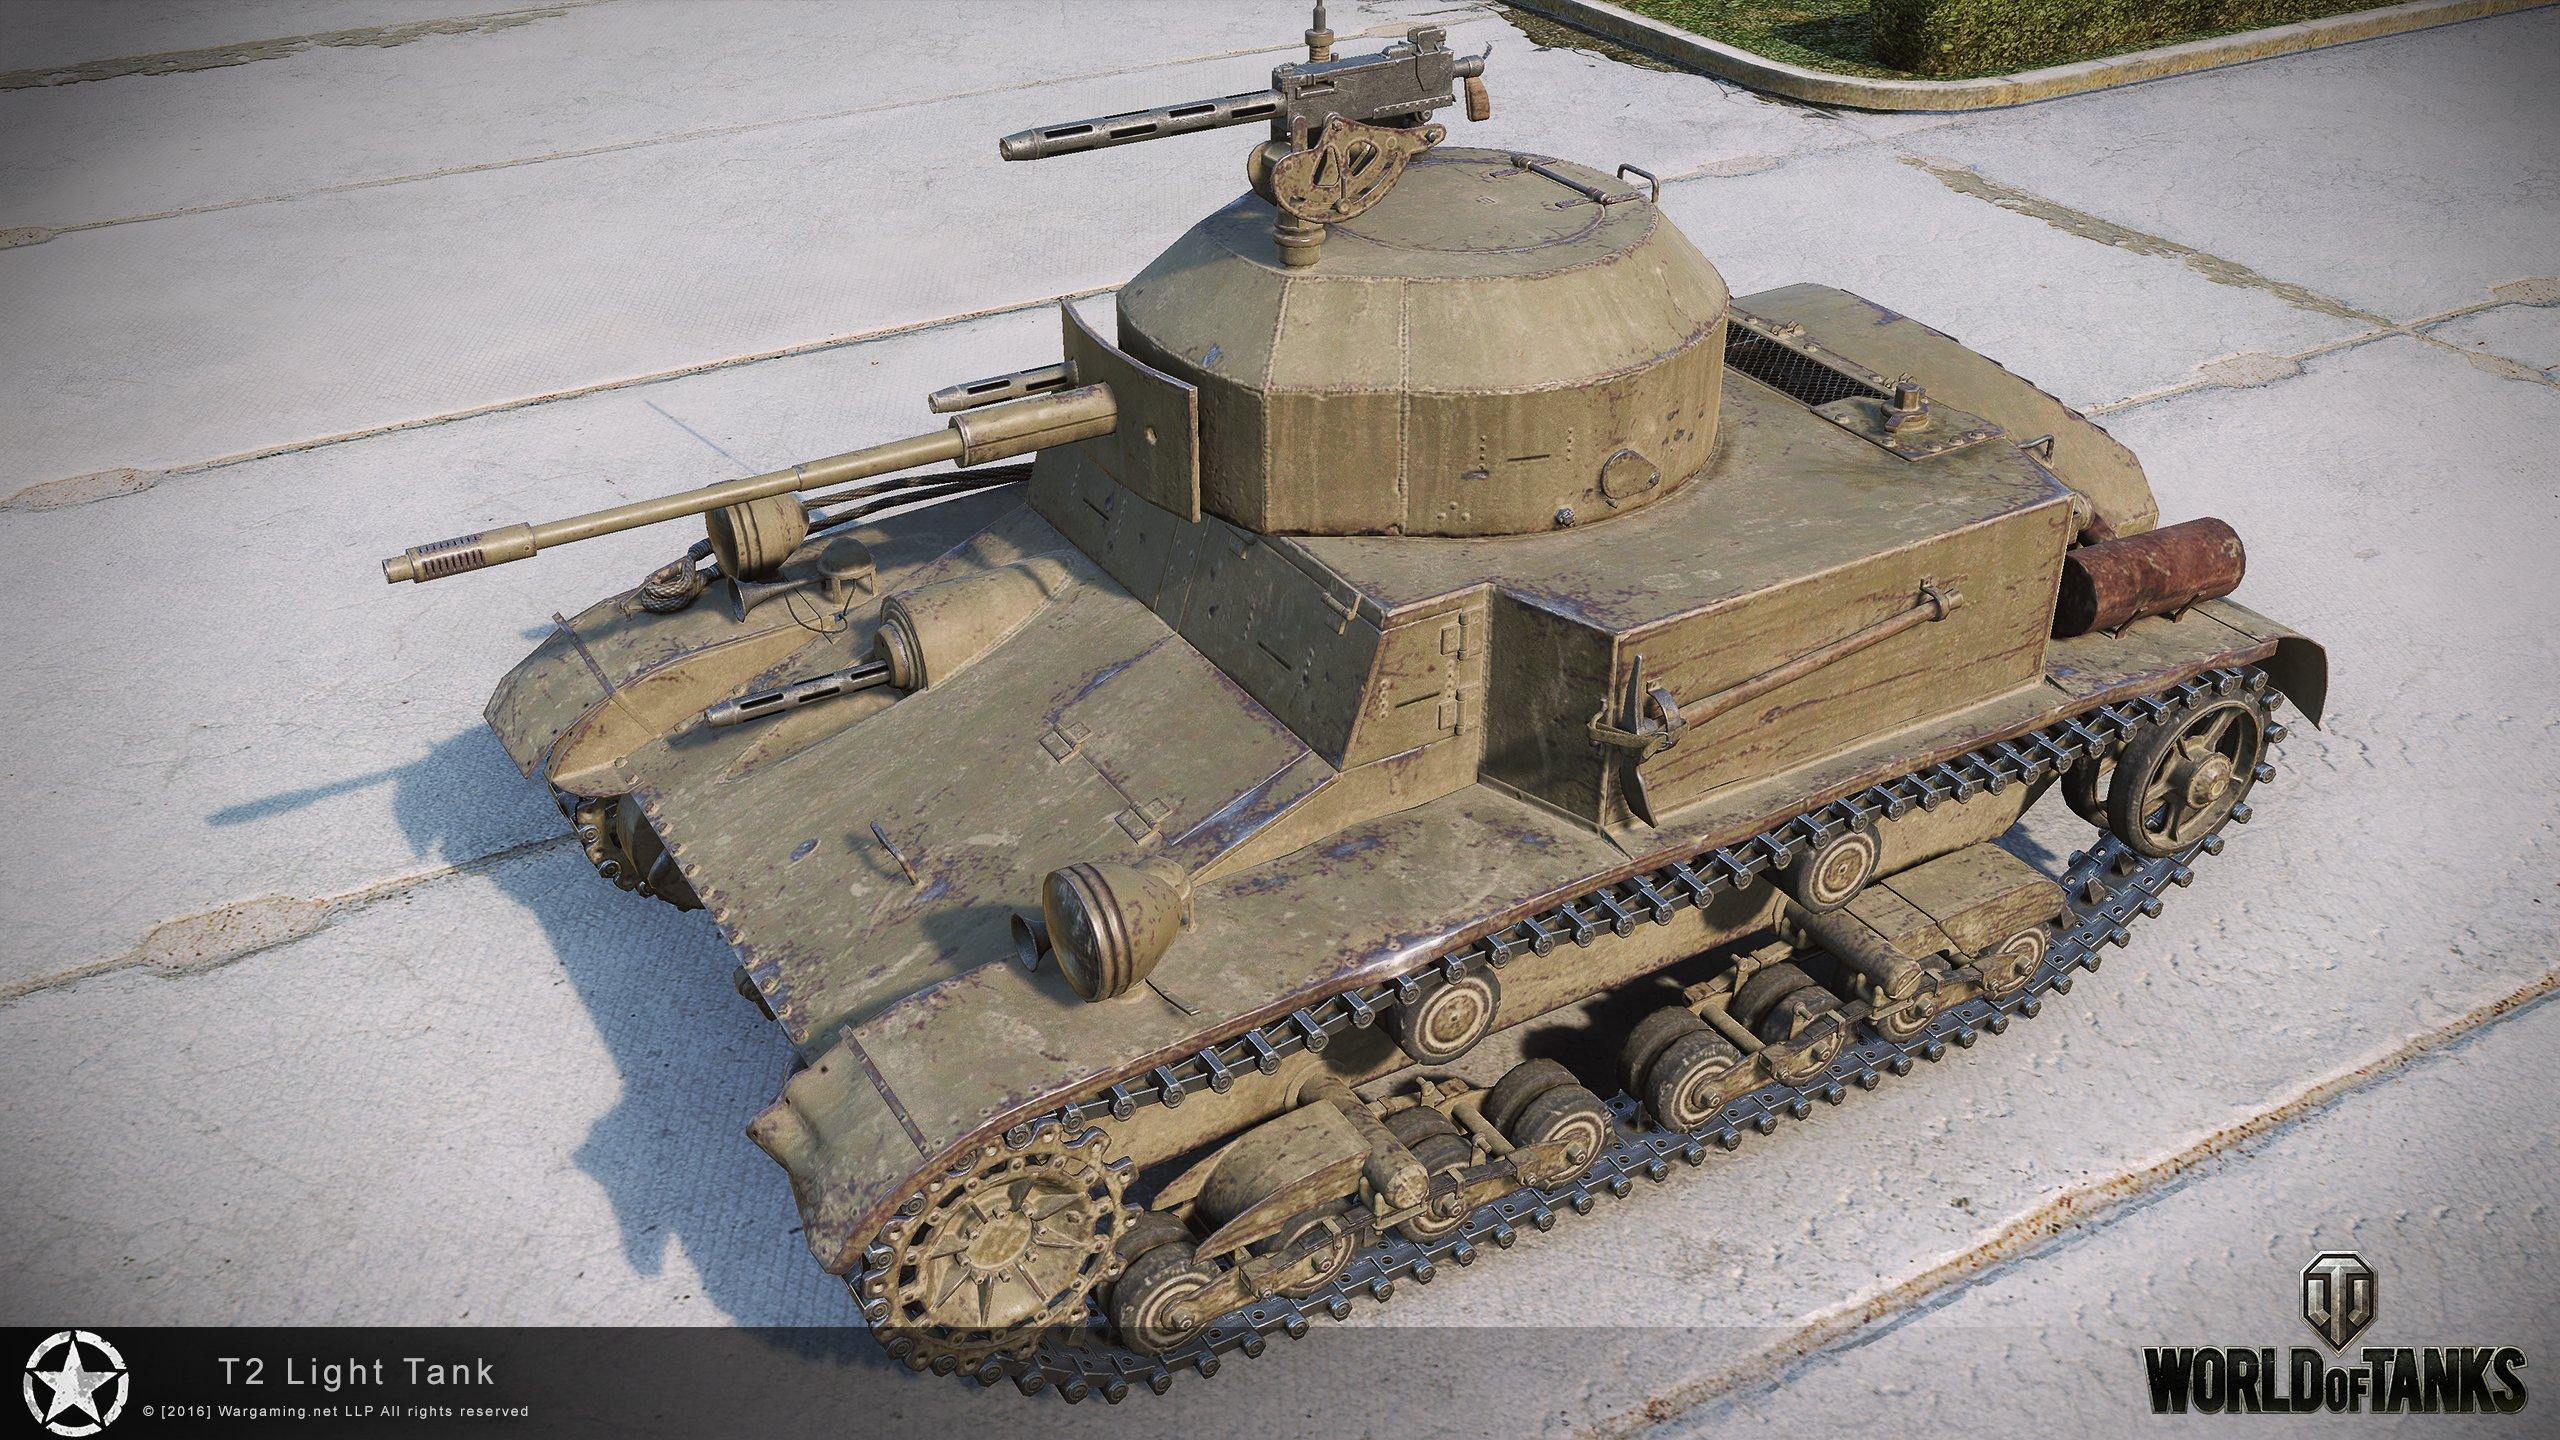 t2 light tank matchmaking